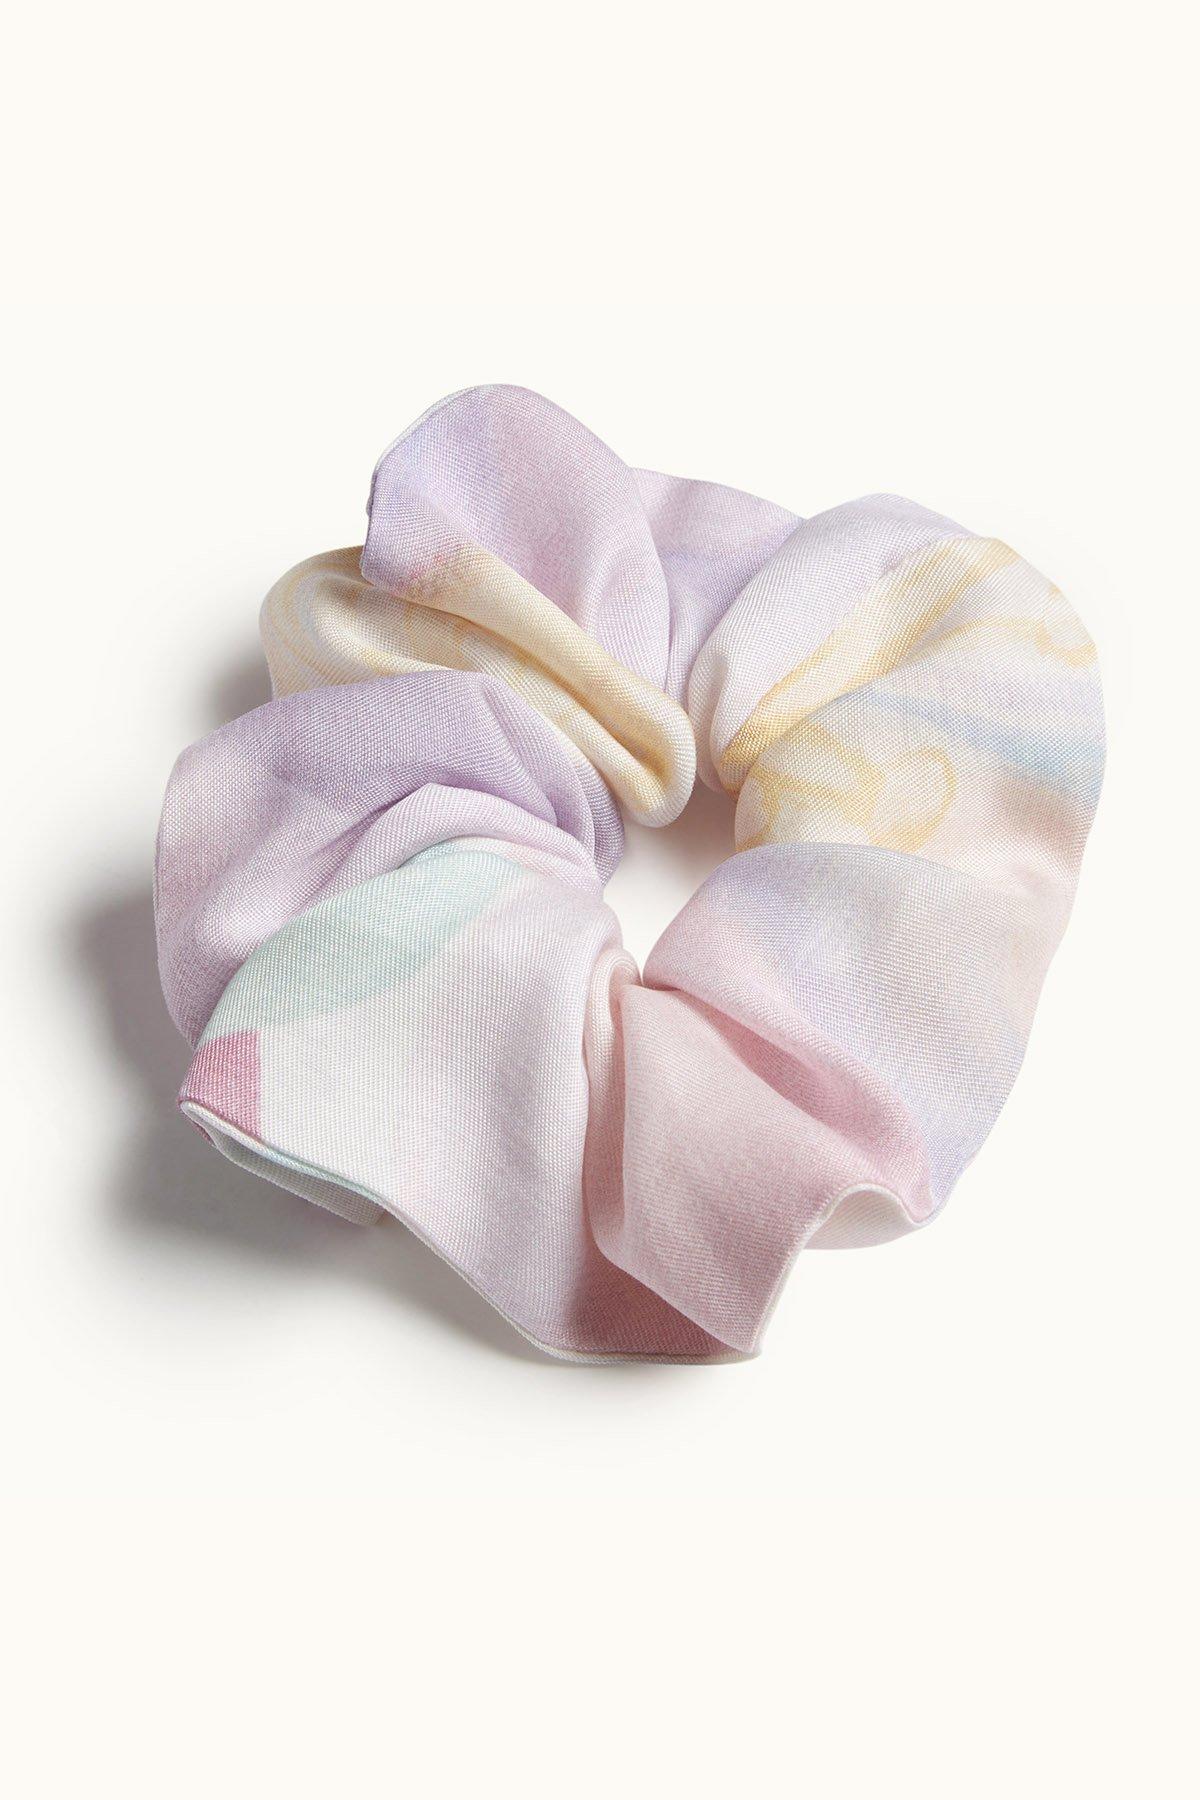 Orchard Moon Sustainable luxury scrunchie Wild Rose print